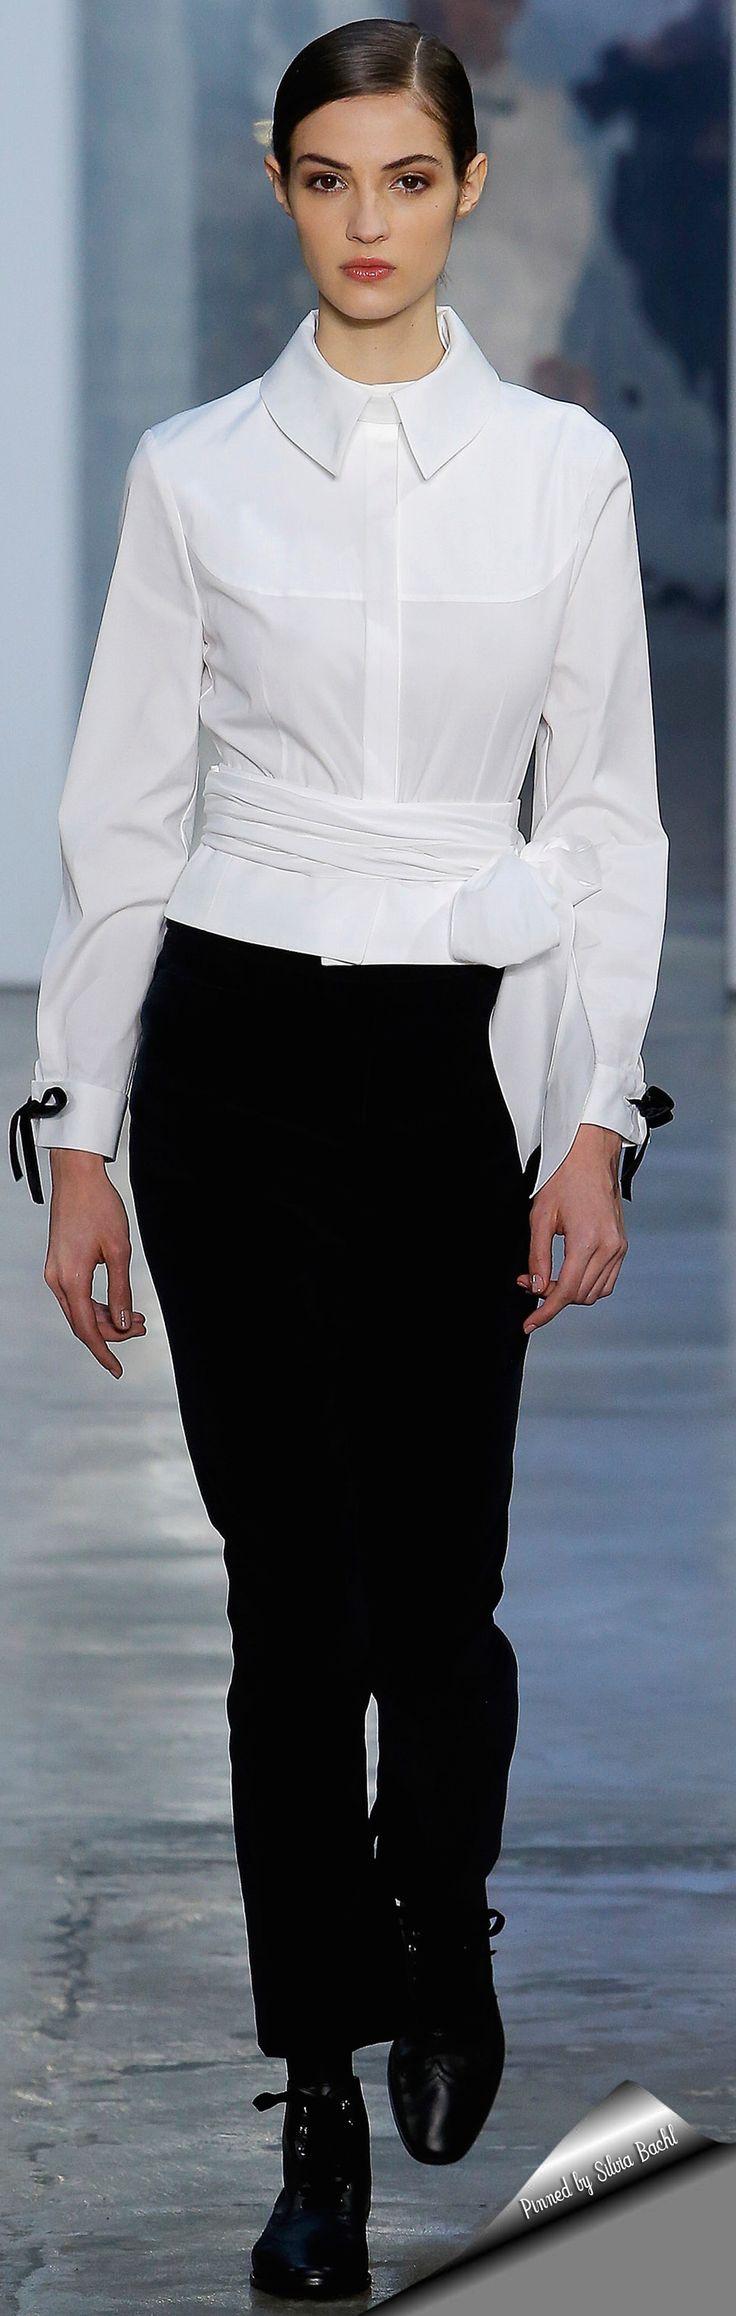 Carolina Herrera at New York Fashion Week Fall 2017.18.